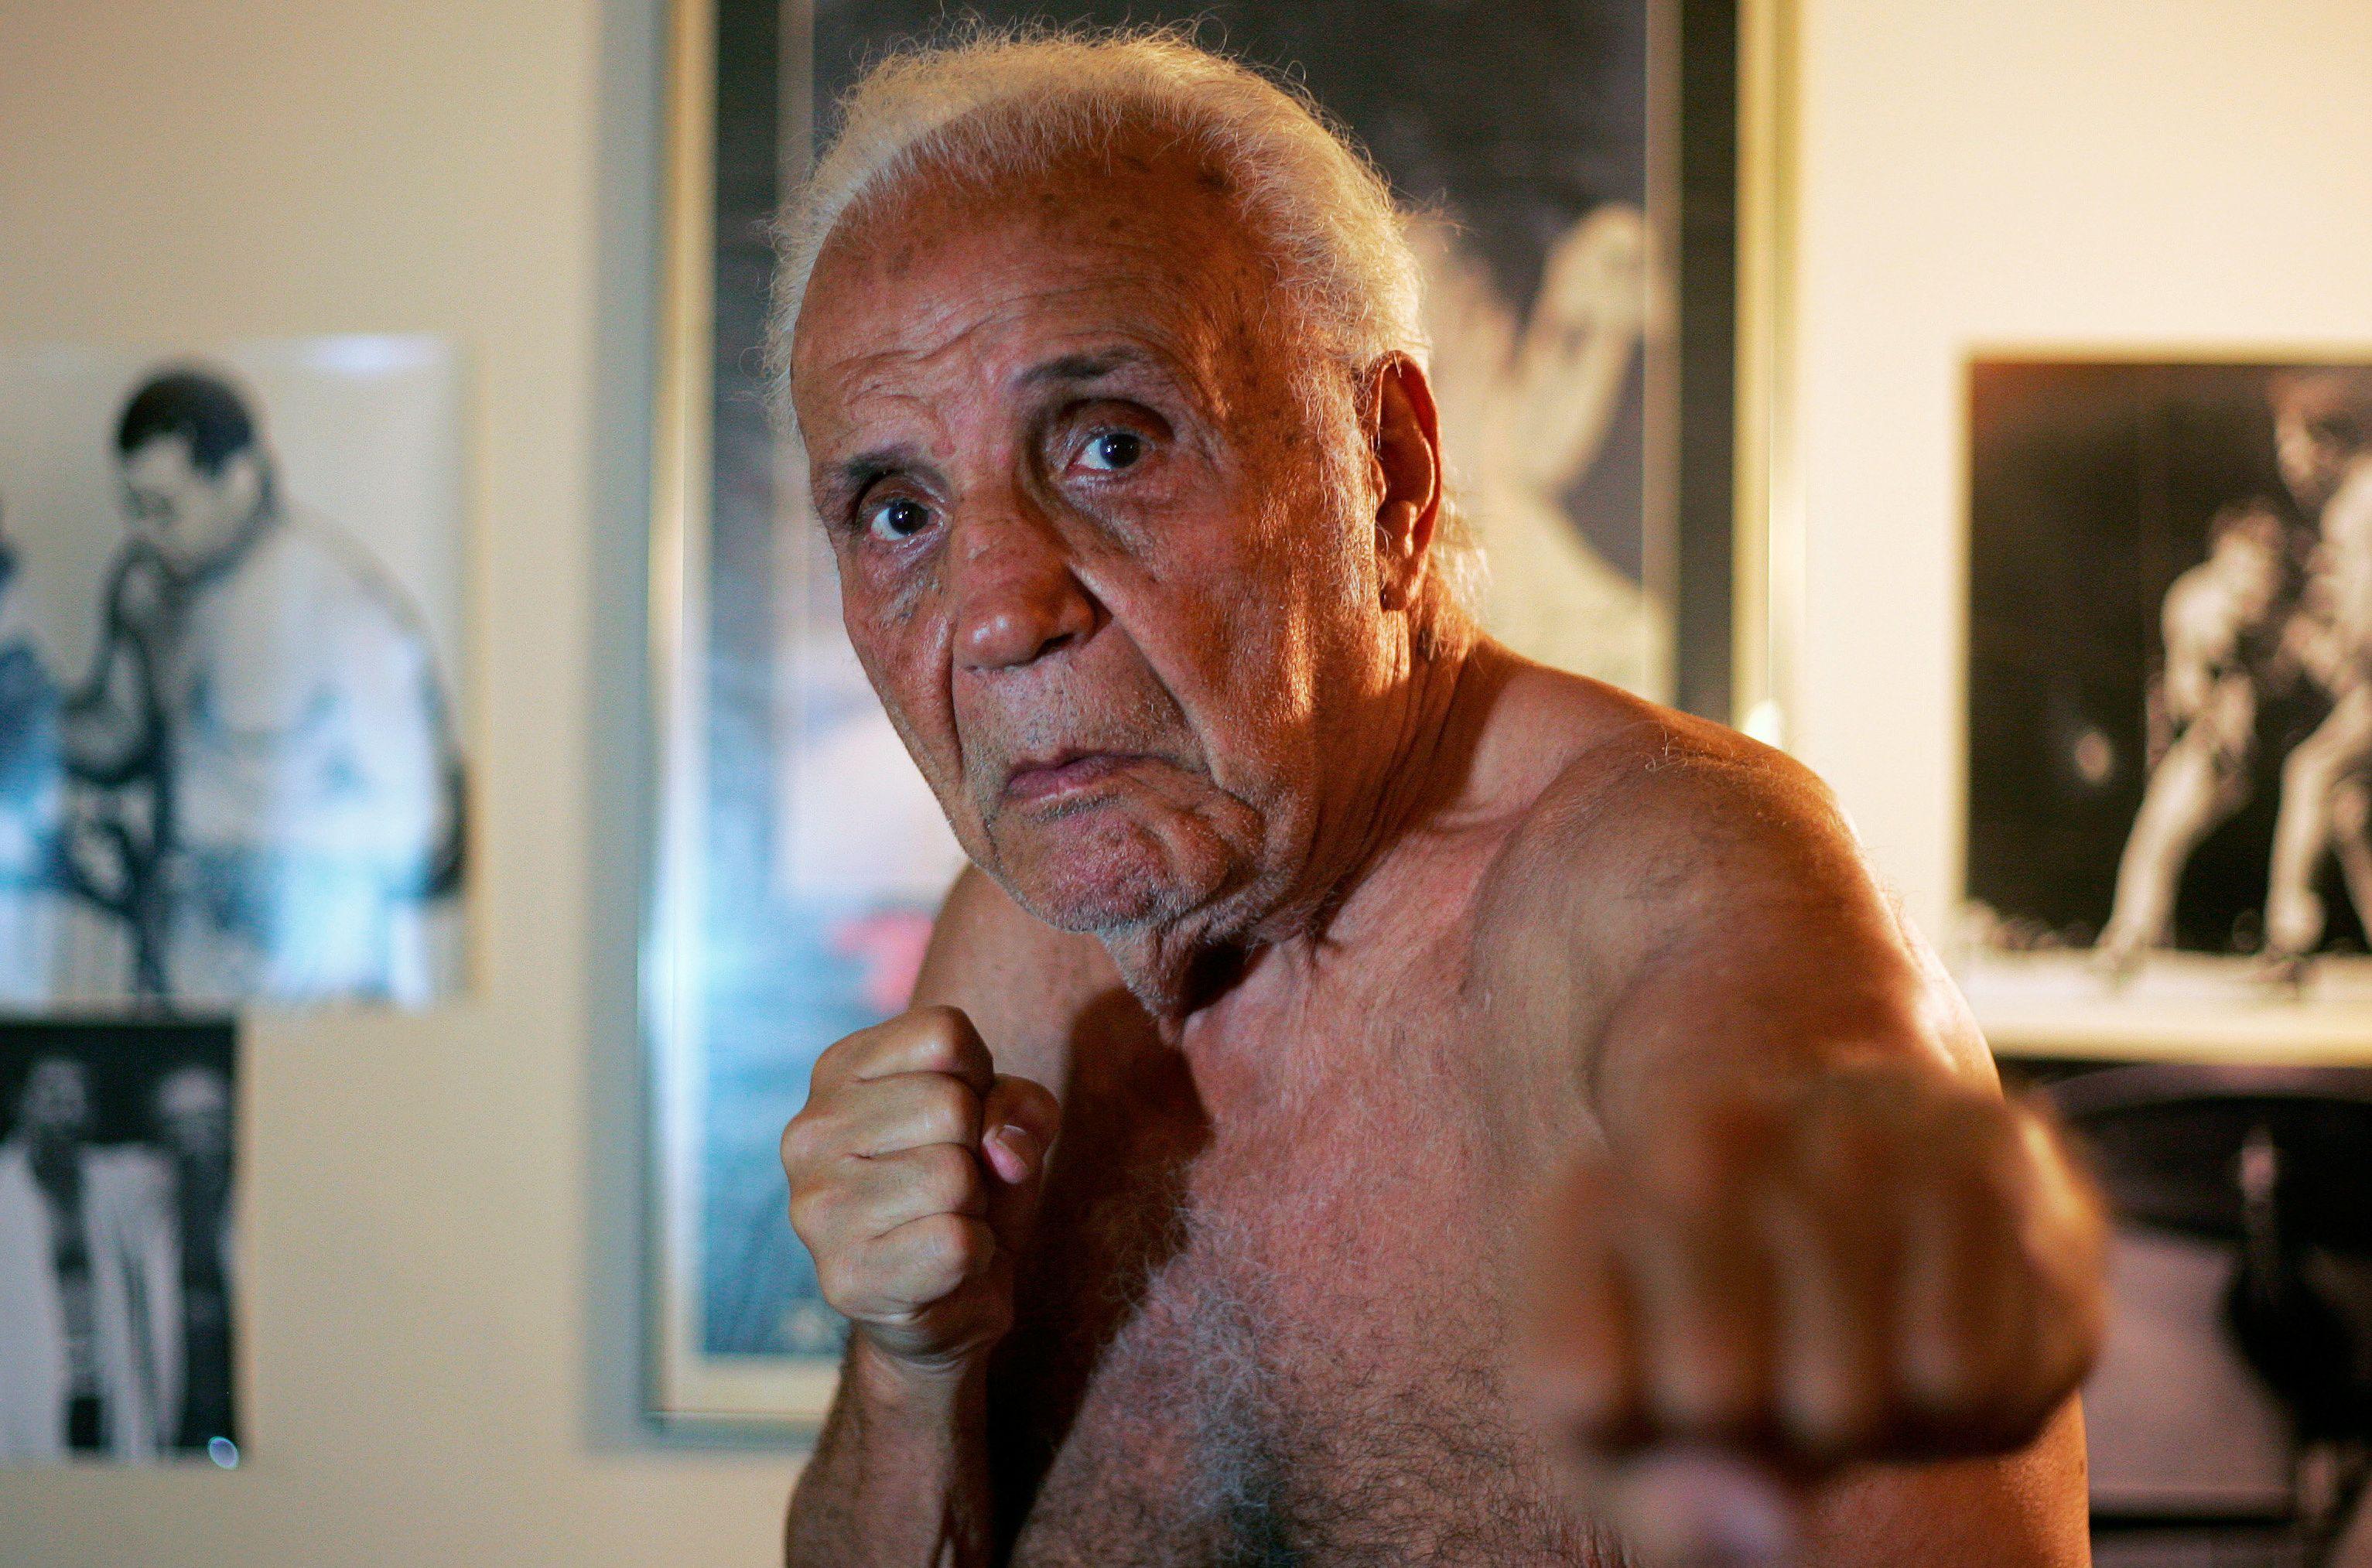 Boxe - Le boxeur Jake LaMotta, «Raging Bull» est mort